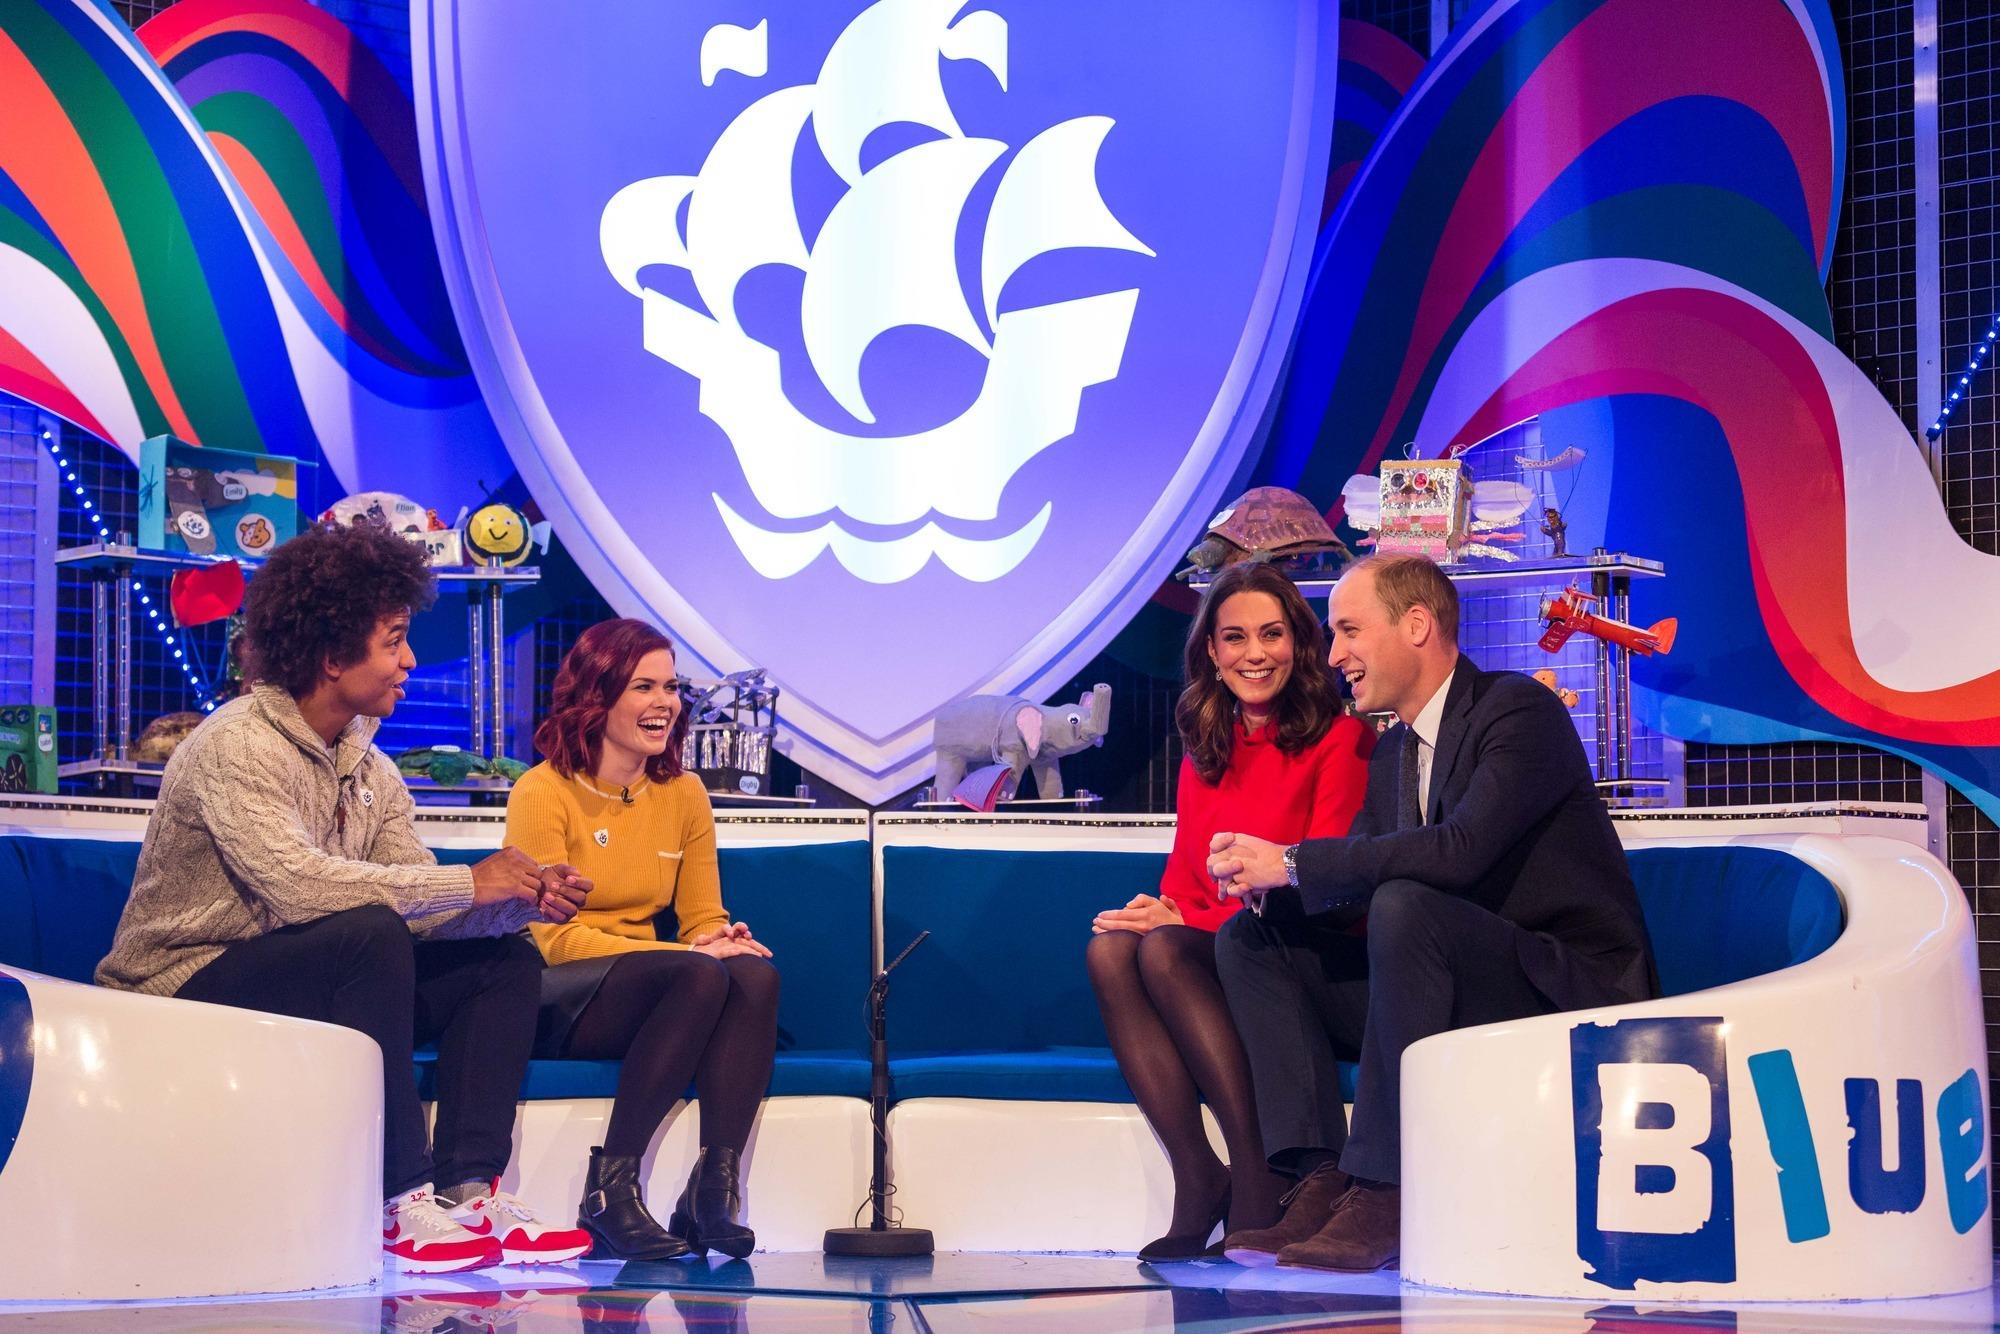 The Duke and Duchess of Cambridge visit Blue Peter (Dan Vernon/BBC/PA)